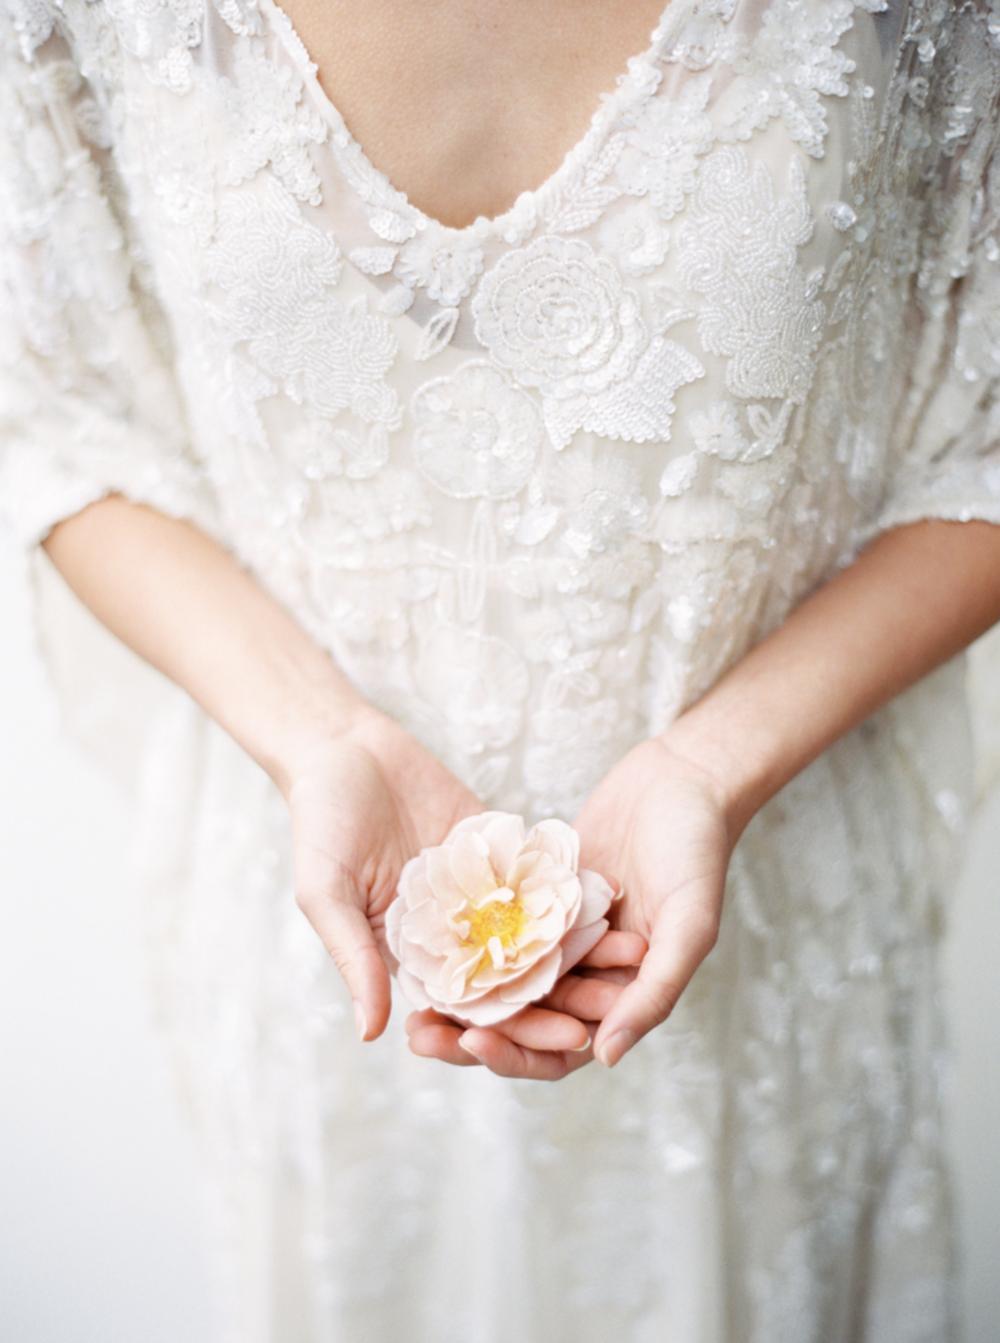 Carol Hannah Bridal Iolite Gown Shanon Moffit Photography 7.png